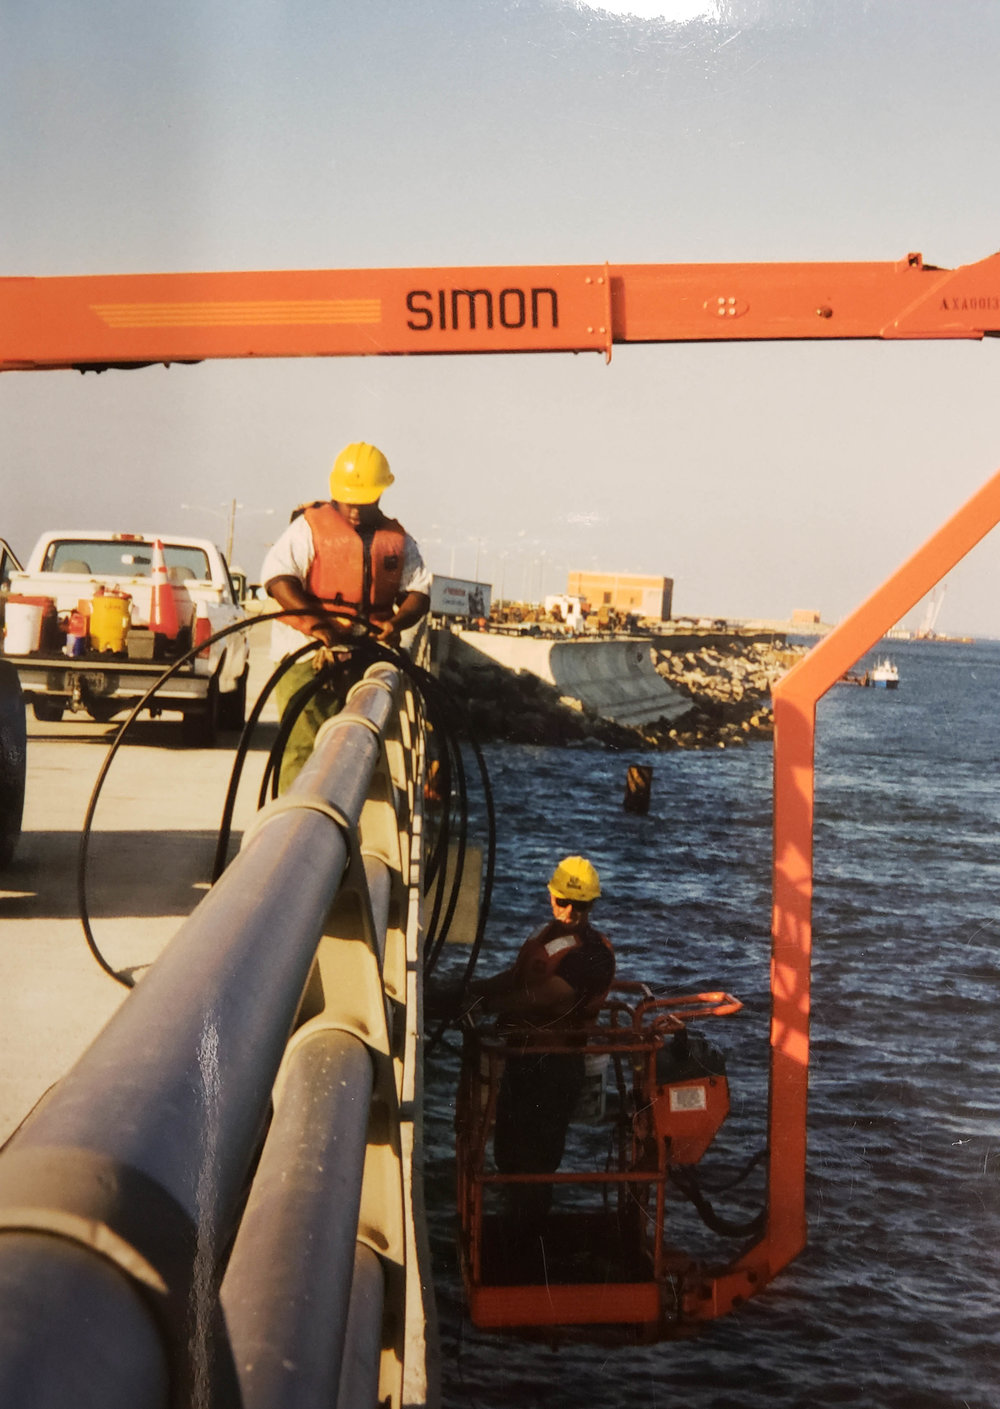 aldridge-electric-top-nationwide-electrical-contractor-infrastructure-development-bridges-roadways-bascule-movable-foundations-drilling.jpg